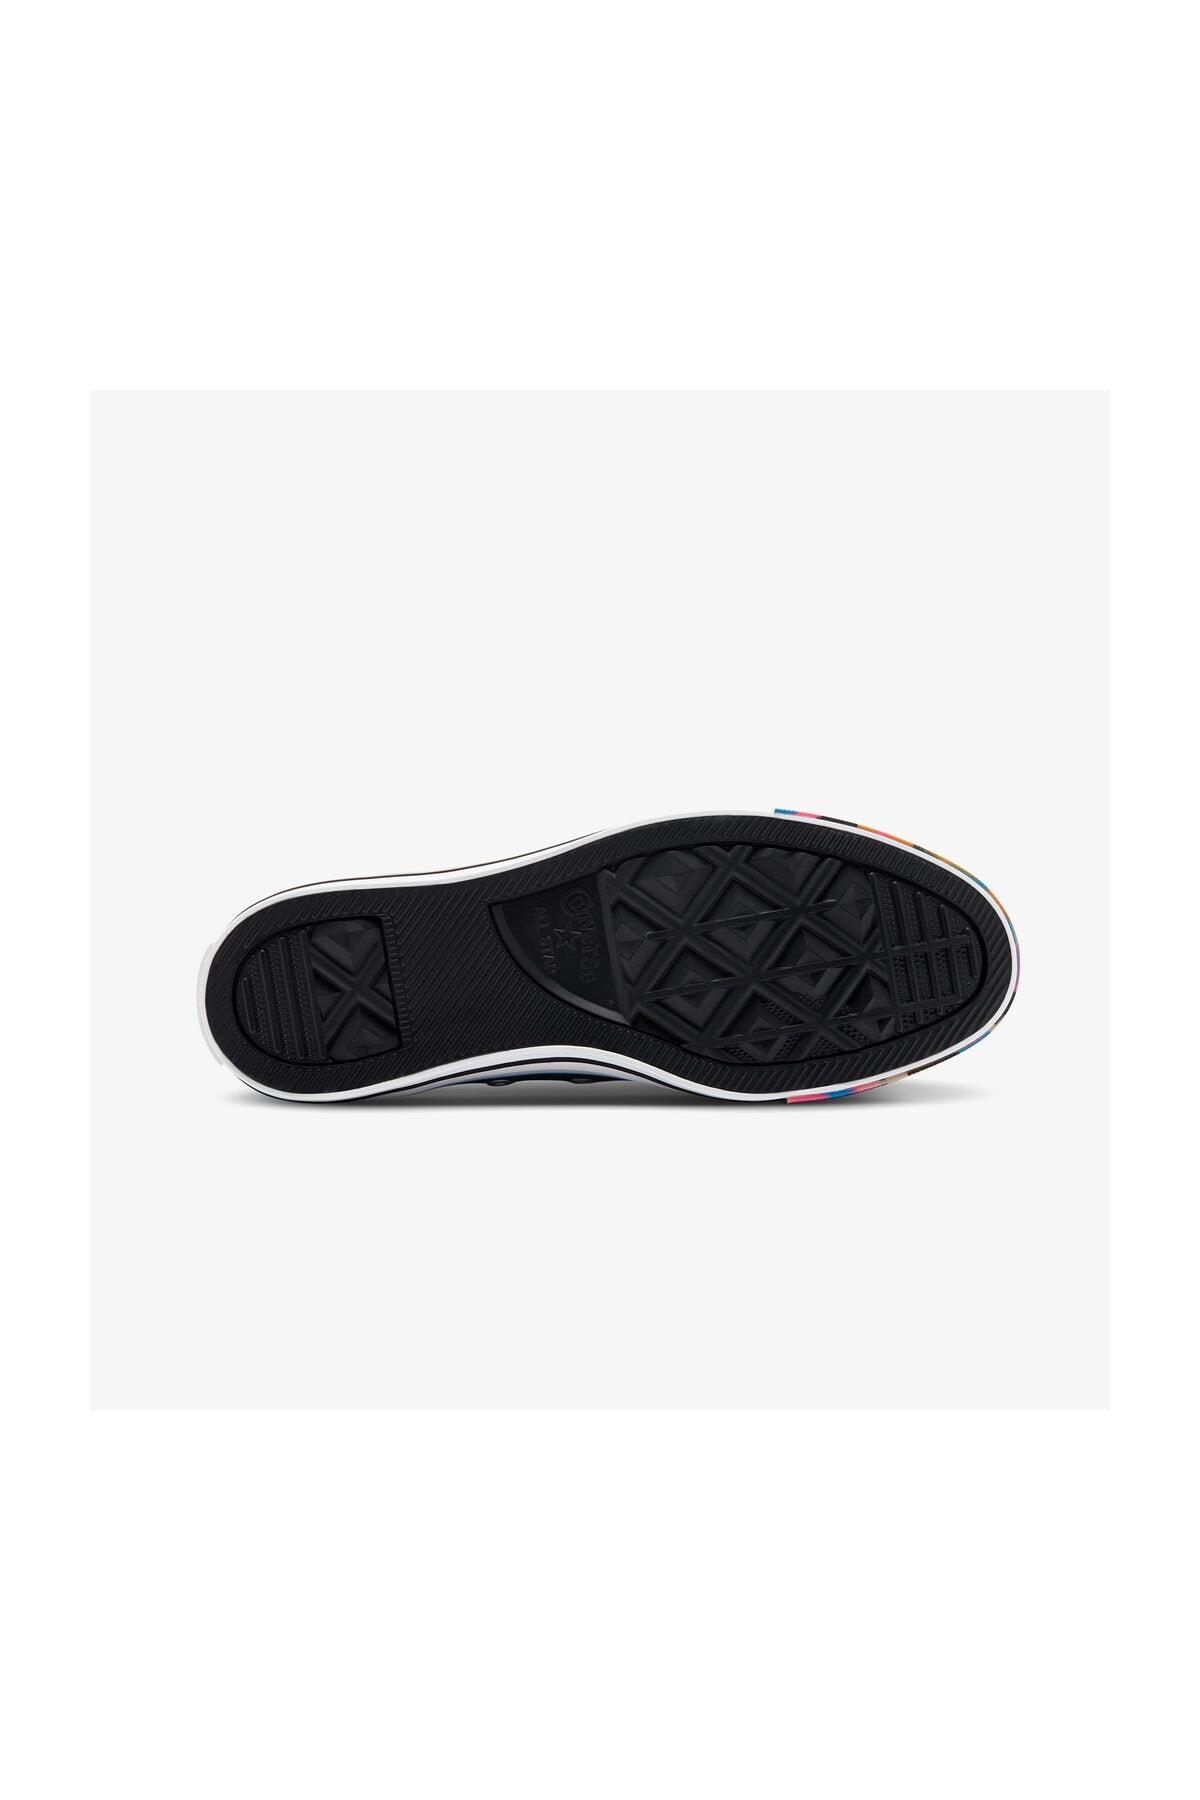 Converse Chuck Taylor All Star Marbled Mash-Up Hi Kadın Siyah Sneaker